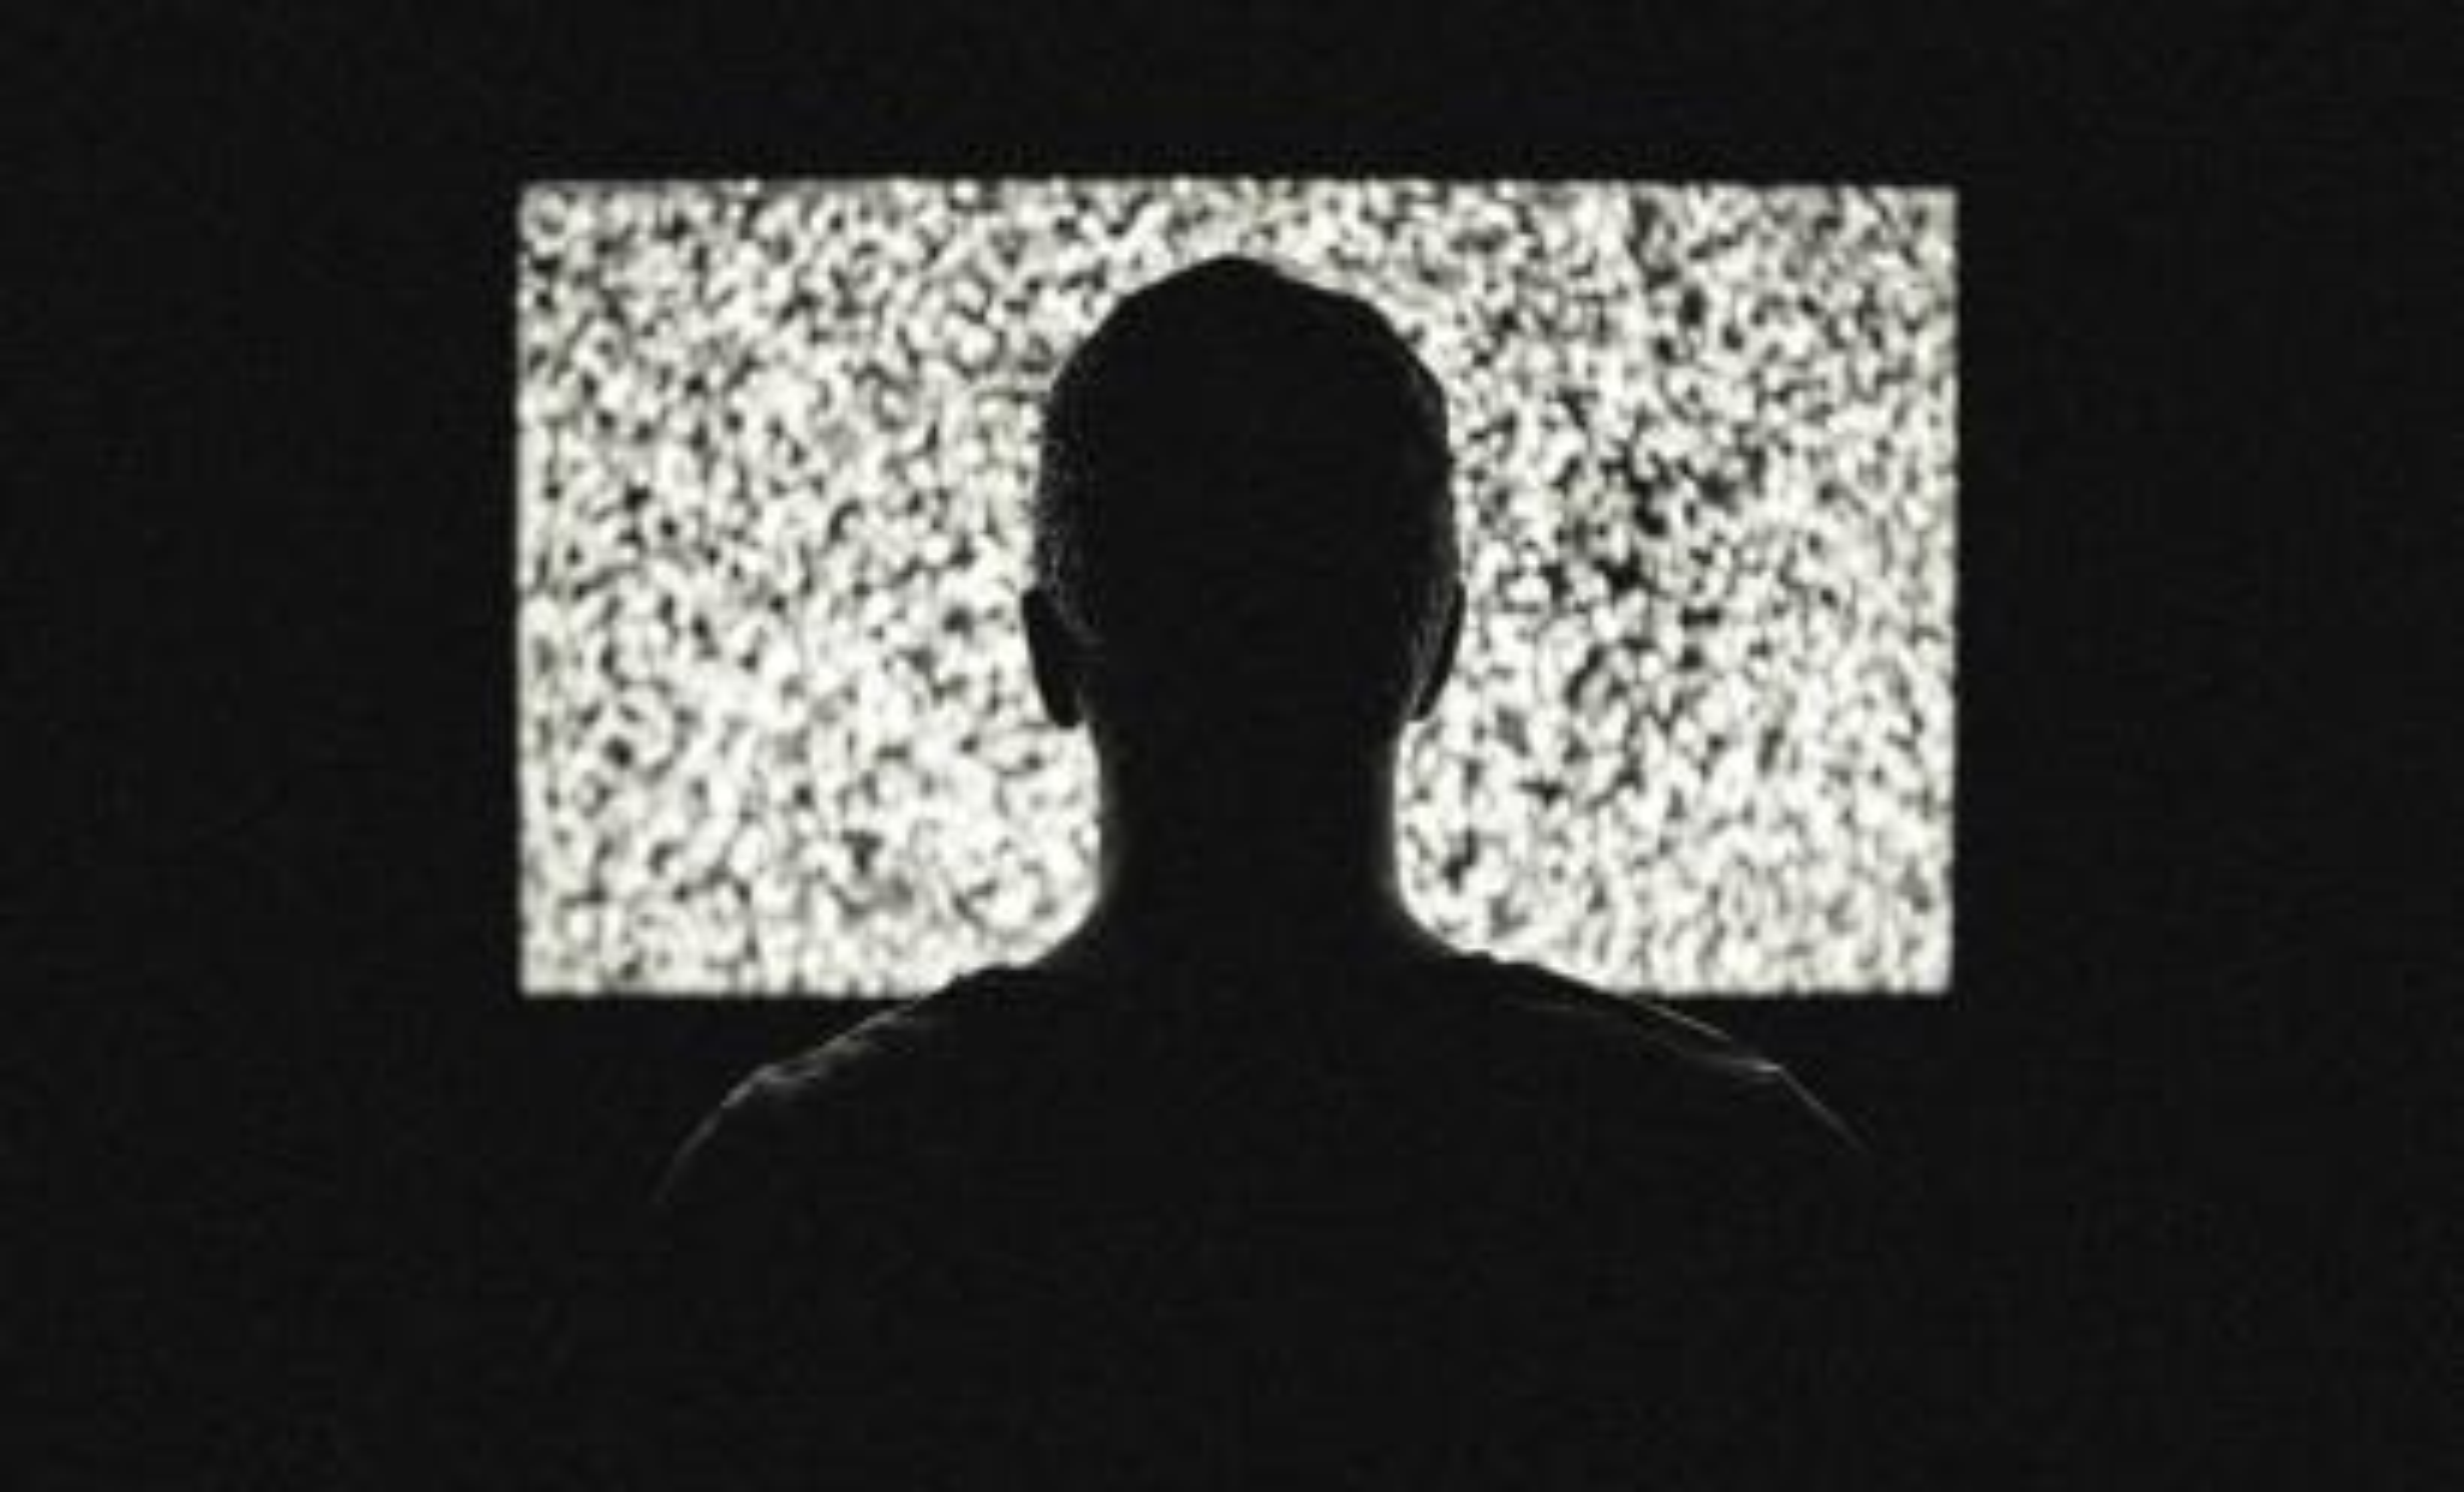 TV overload